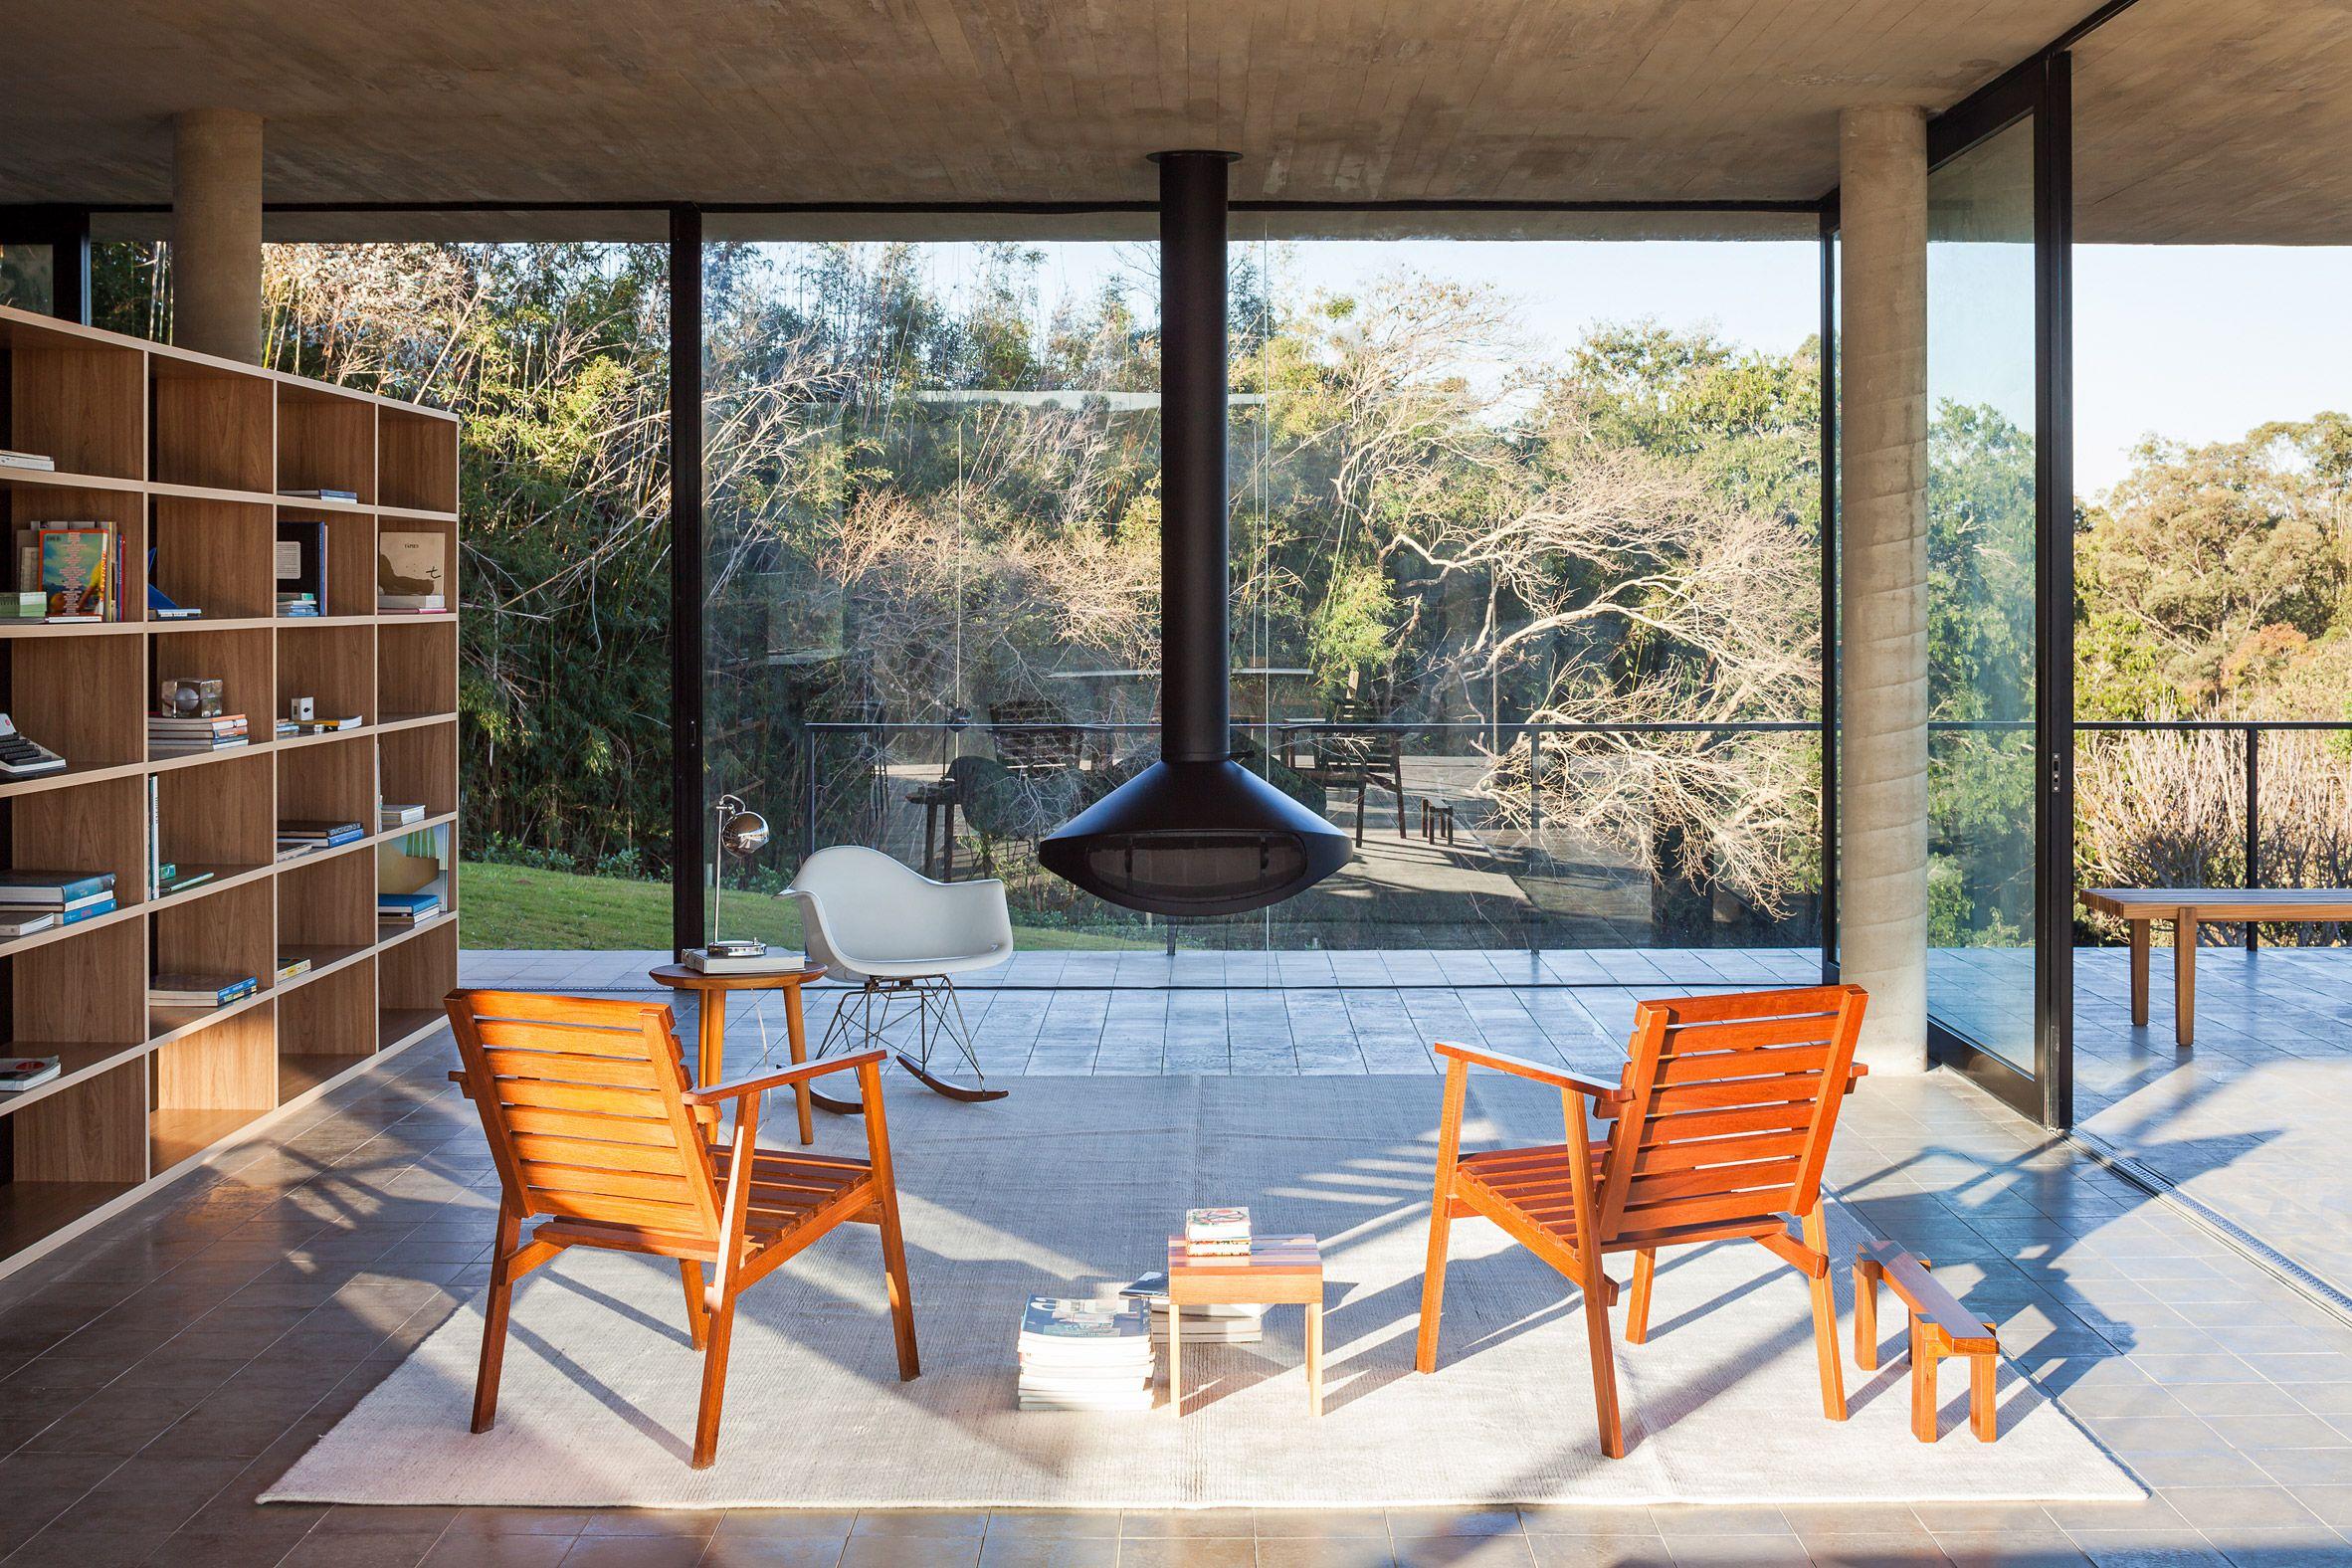 Delightful Photography: Pedro Vannucchi ||| Sweet Home Make Interior Decoration, Interior  Design Ideas, Home Decor, Home Decoration Ideas, Design Decoration Ideas,  ...